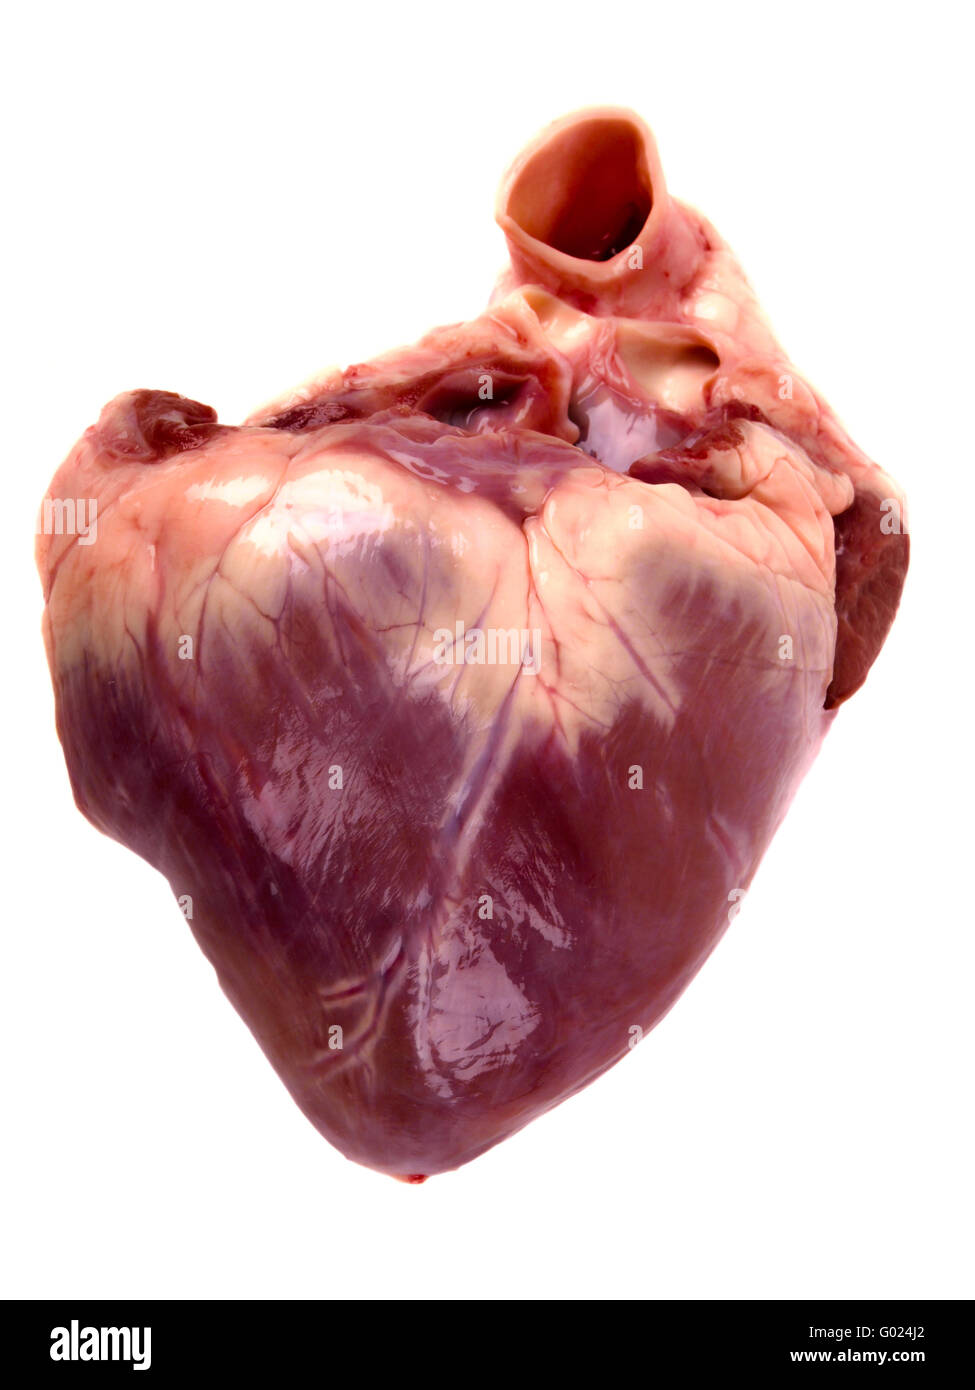 Corazón de cerdo. Cerrar sobre fondo blanco. Imagen De Stock